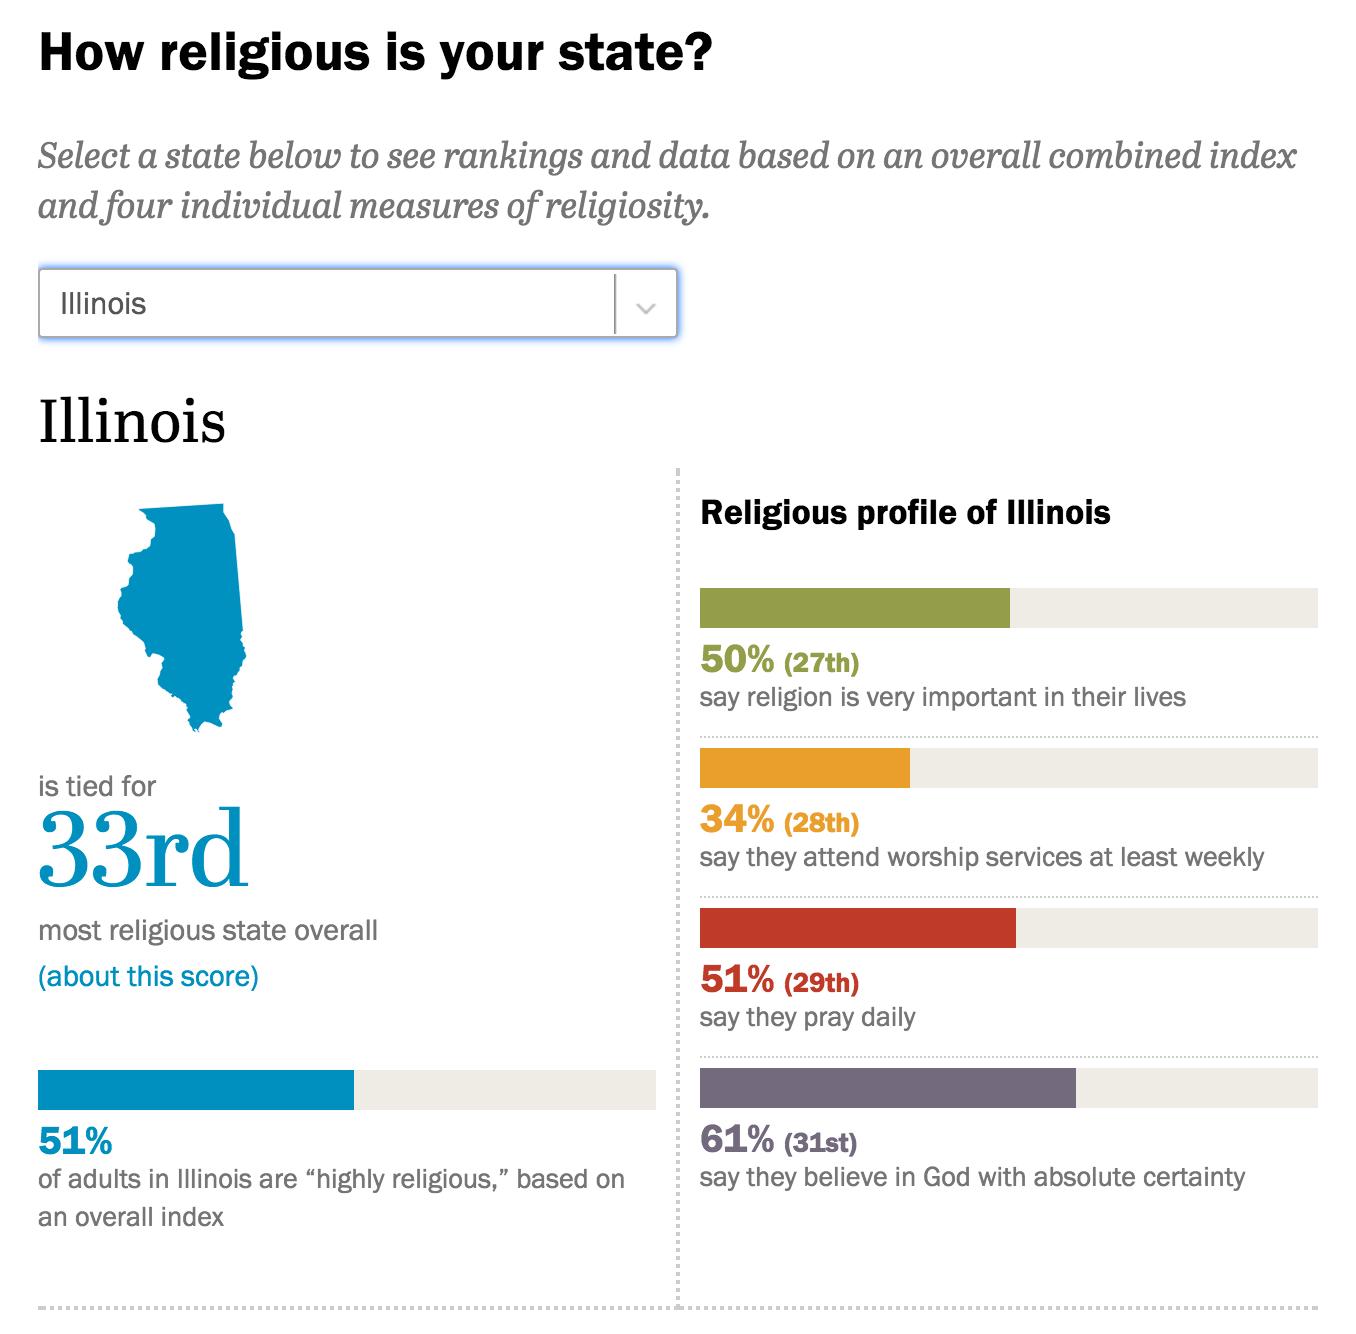 IllinoisReligious